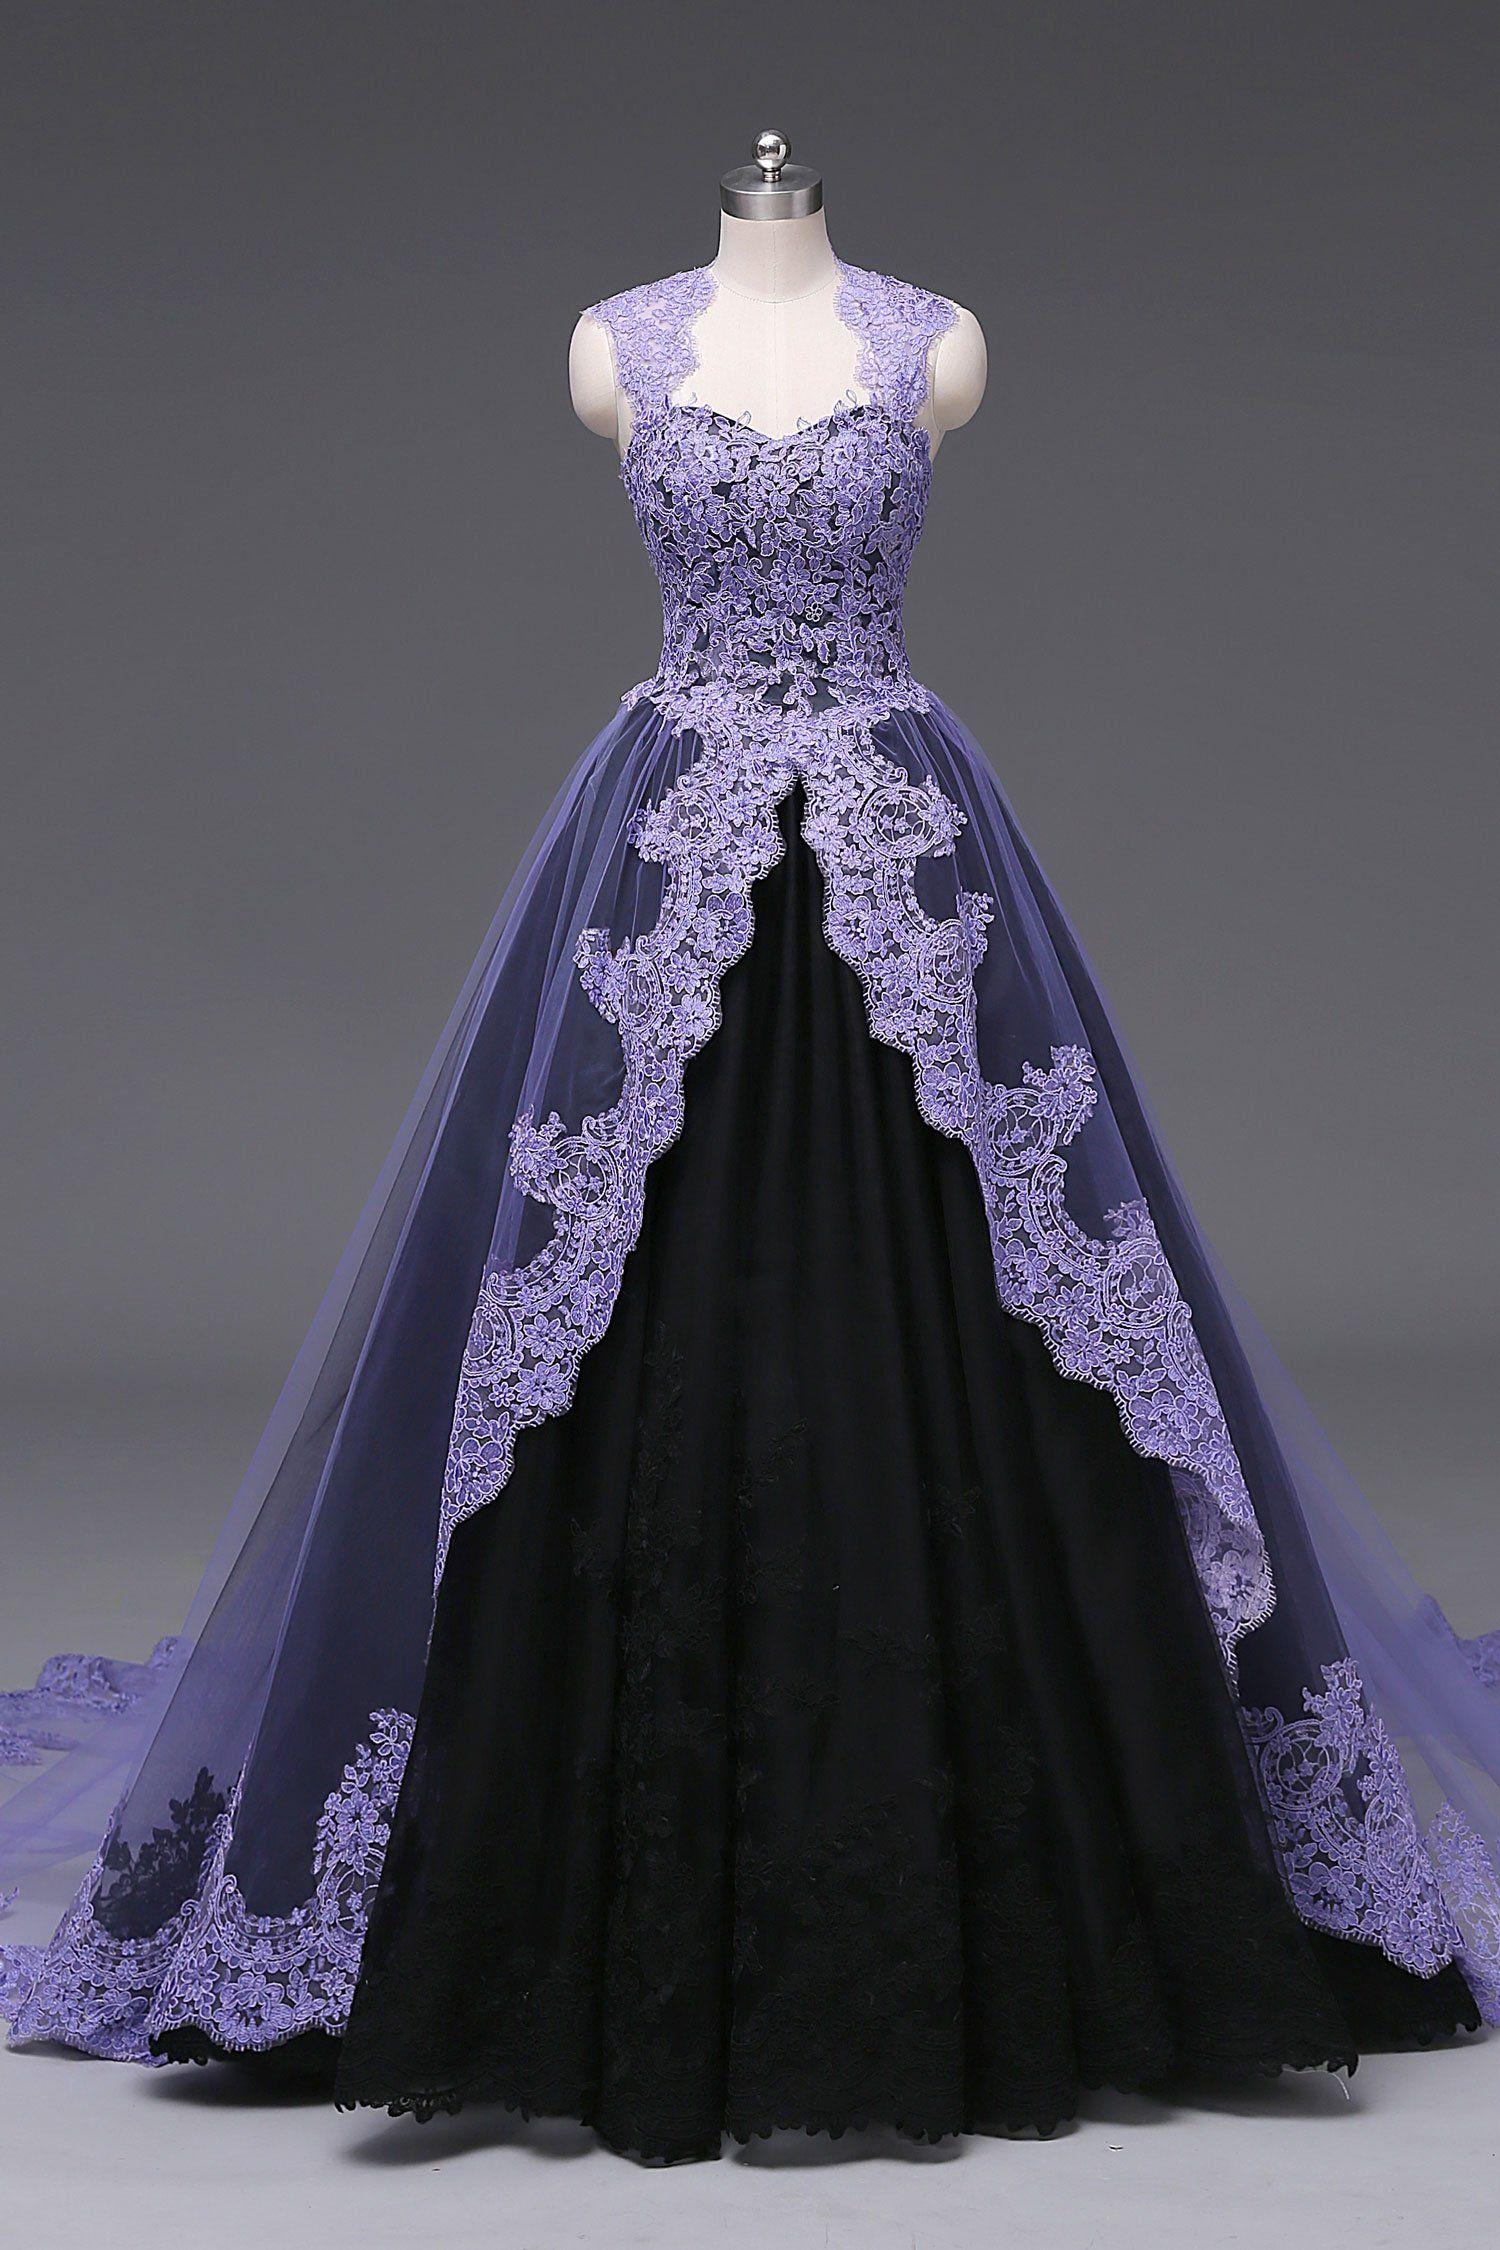 Unique Purple Black Ball Gown Wedding Dress October In 2021 Black Ball Gown Wedding Dresses Unique Gothic Wedding Dress [ 2250 x 1500 Pixel ]